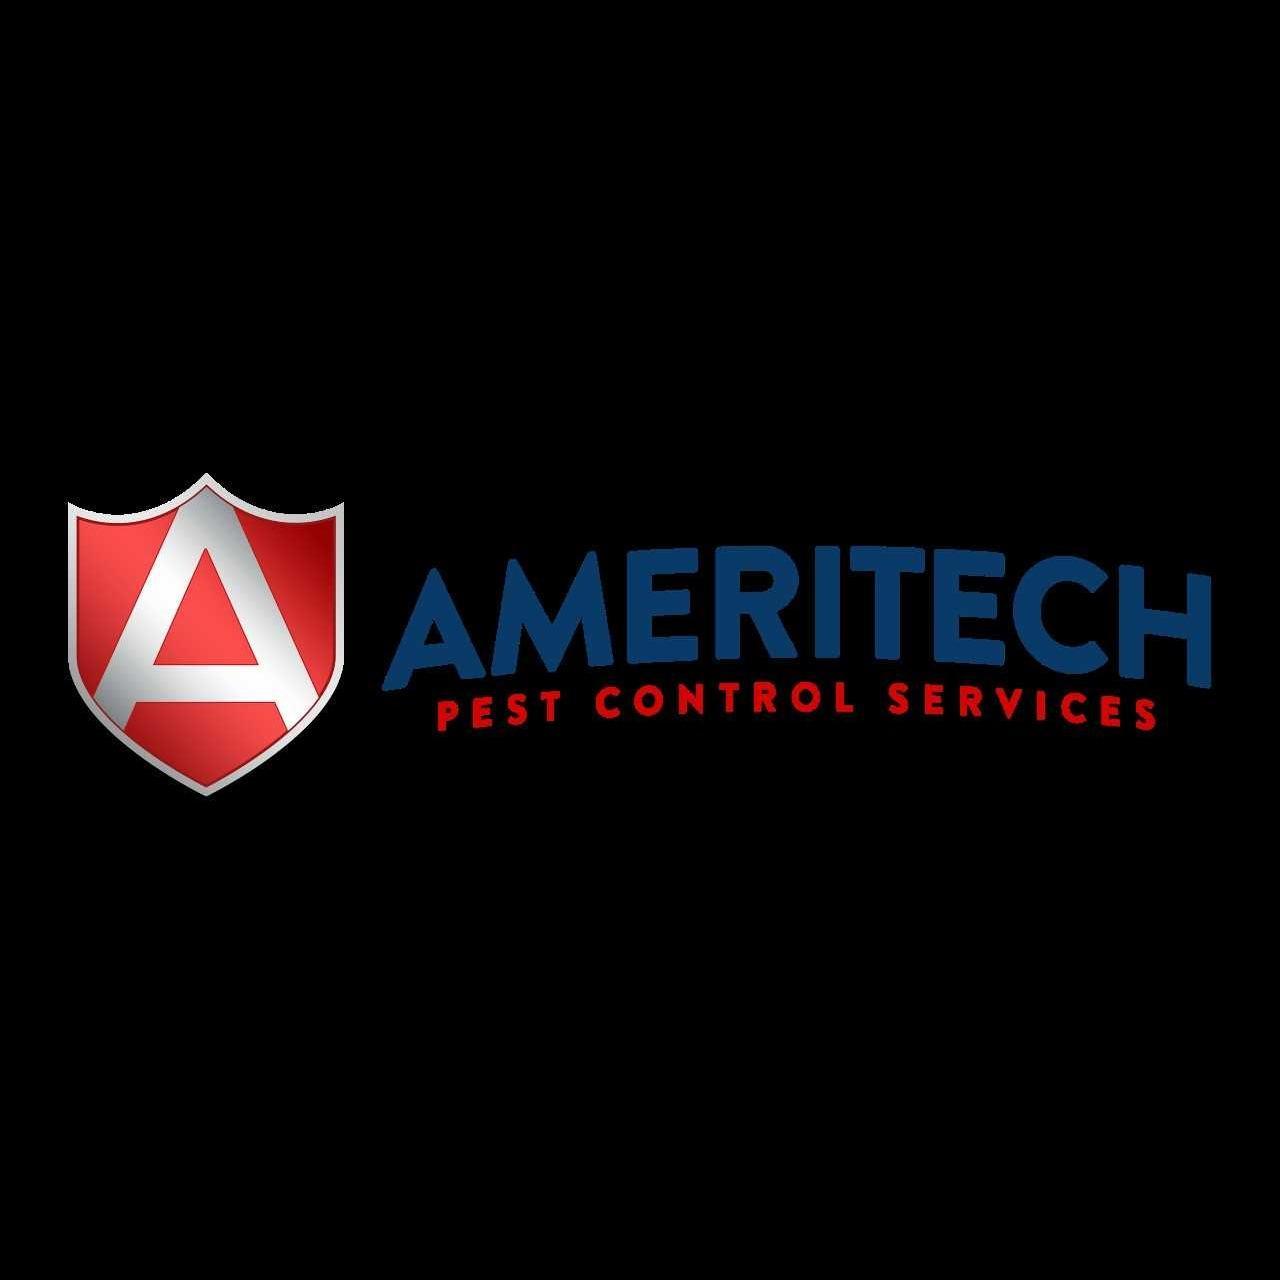 Ameritech Pest Control Services, Inc. - Cape Coral, FL - Pest & Animal Control